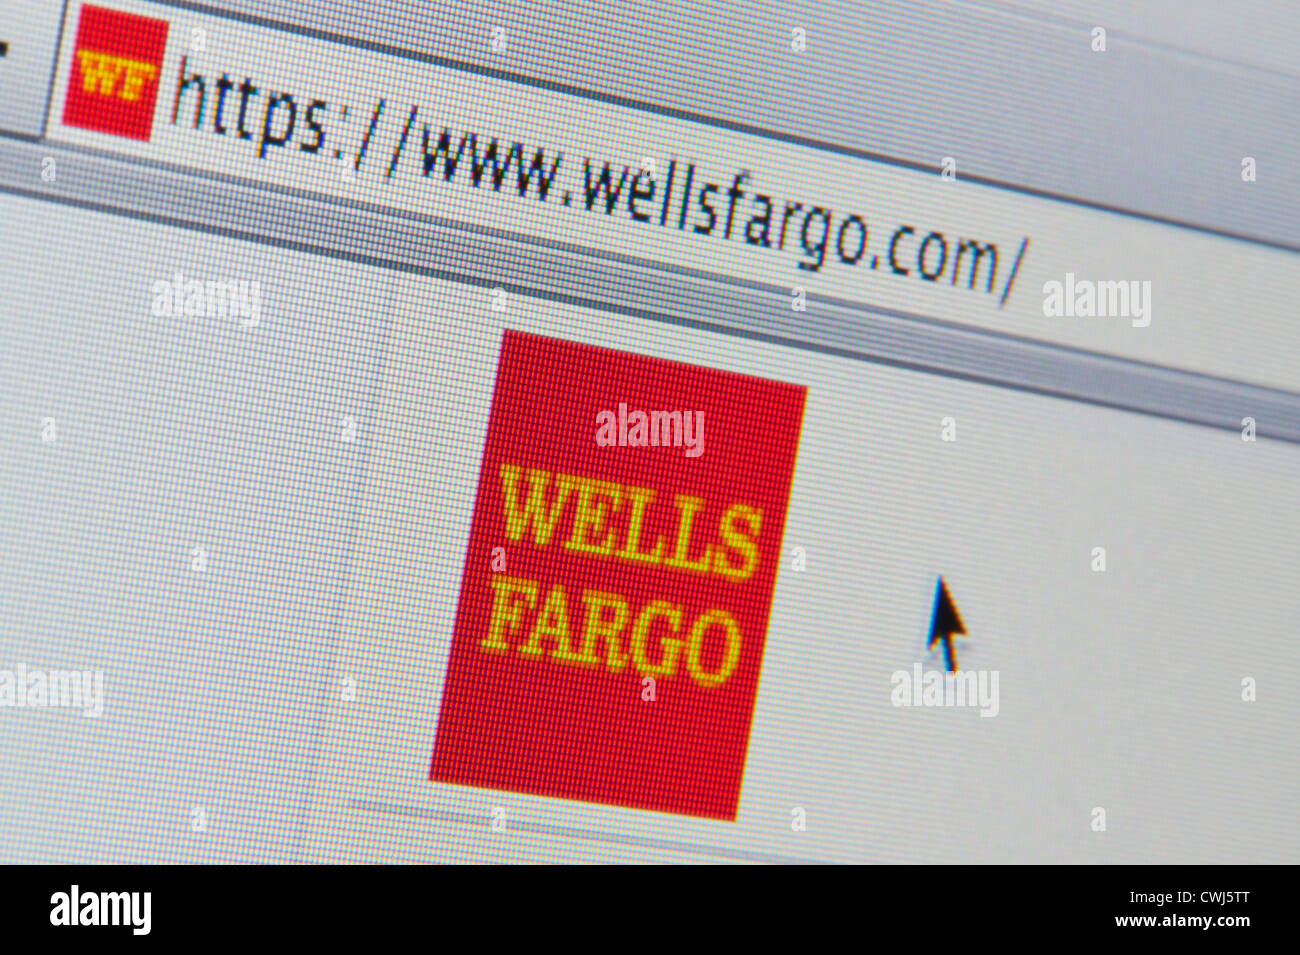 Wells Fargo Wiring Instructions Alabama Trusted Diagram Logo Stock Photos Images Alamy Of Harness Peterbilt